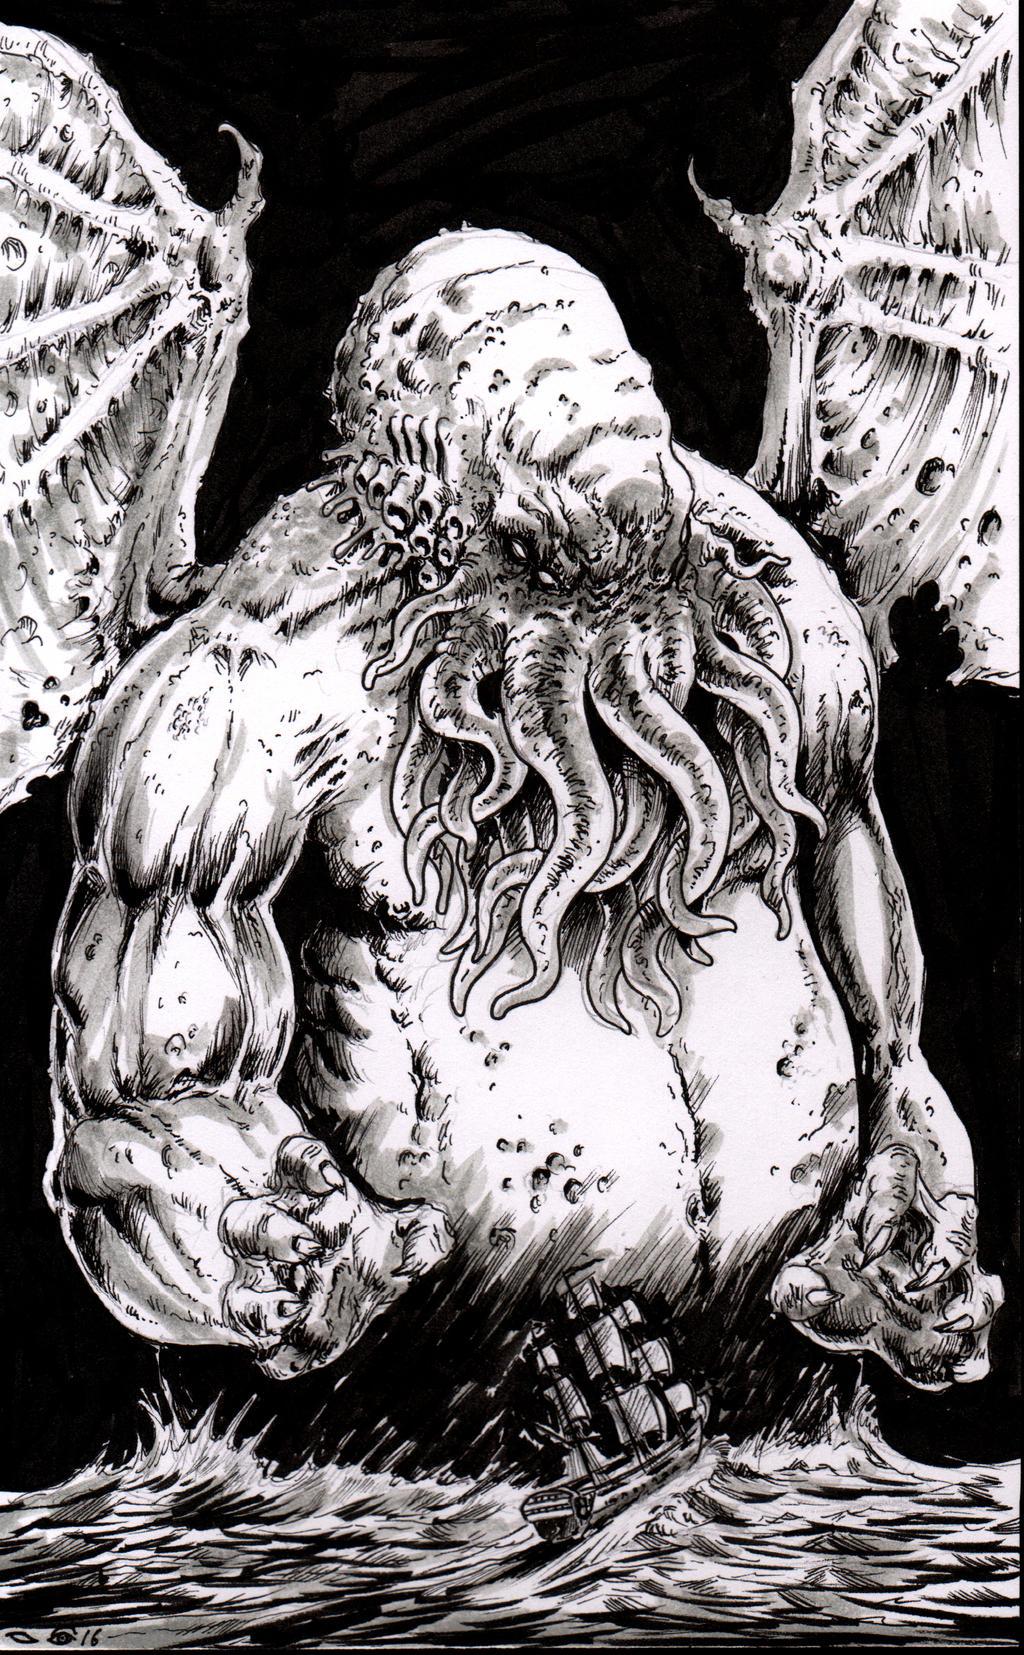 Big Cthulhu by emalterre